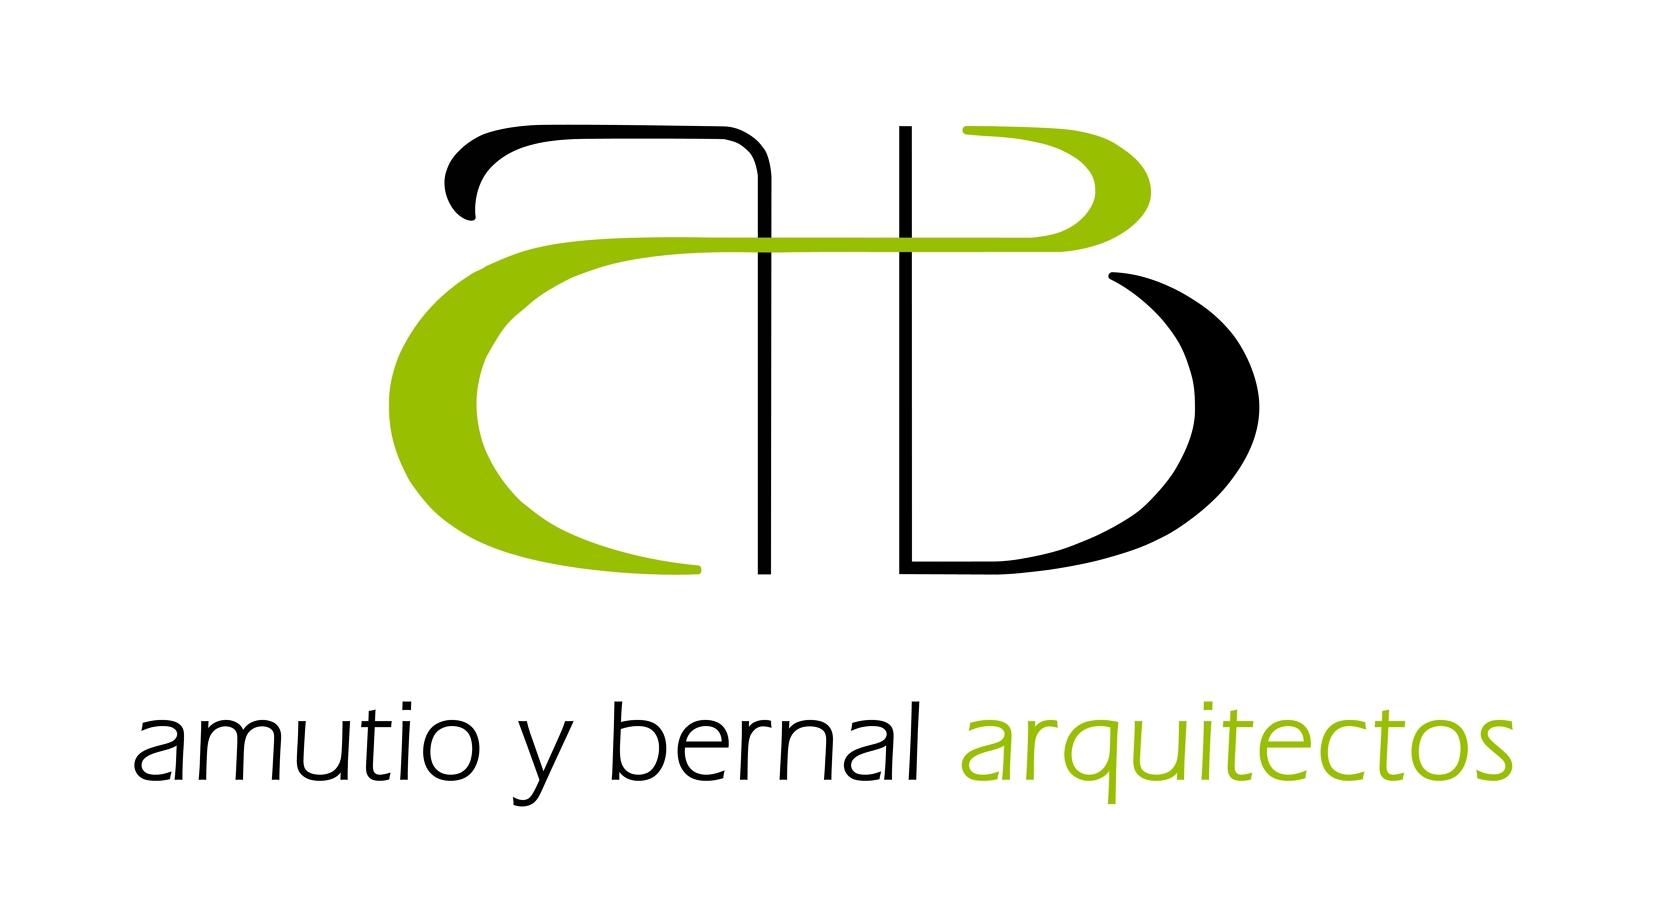 Marvelous Foto Arquitectos Arquitectura Arquitecto De Amutio Y Amutio Y Bernal  Arquitectos